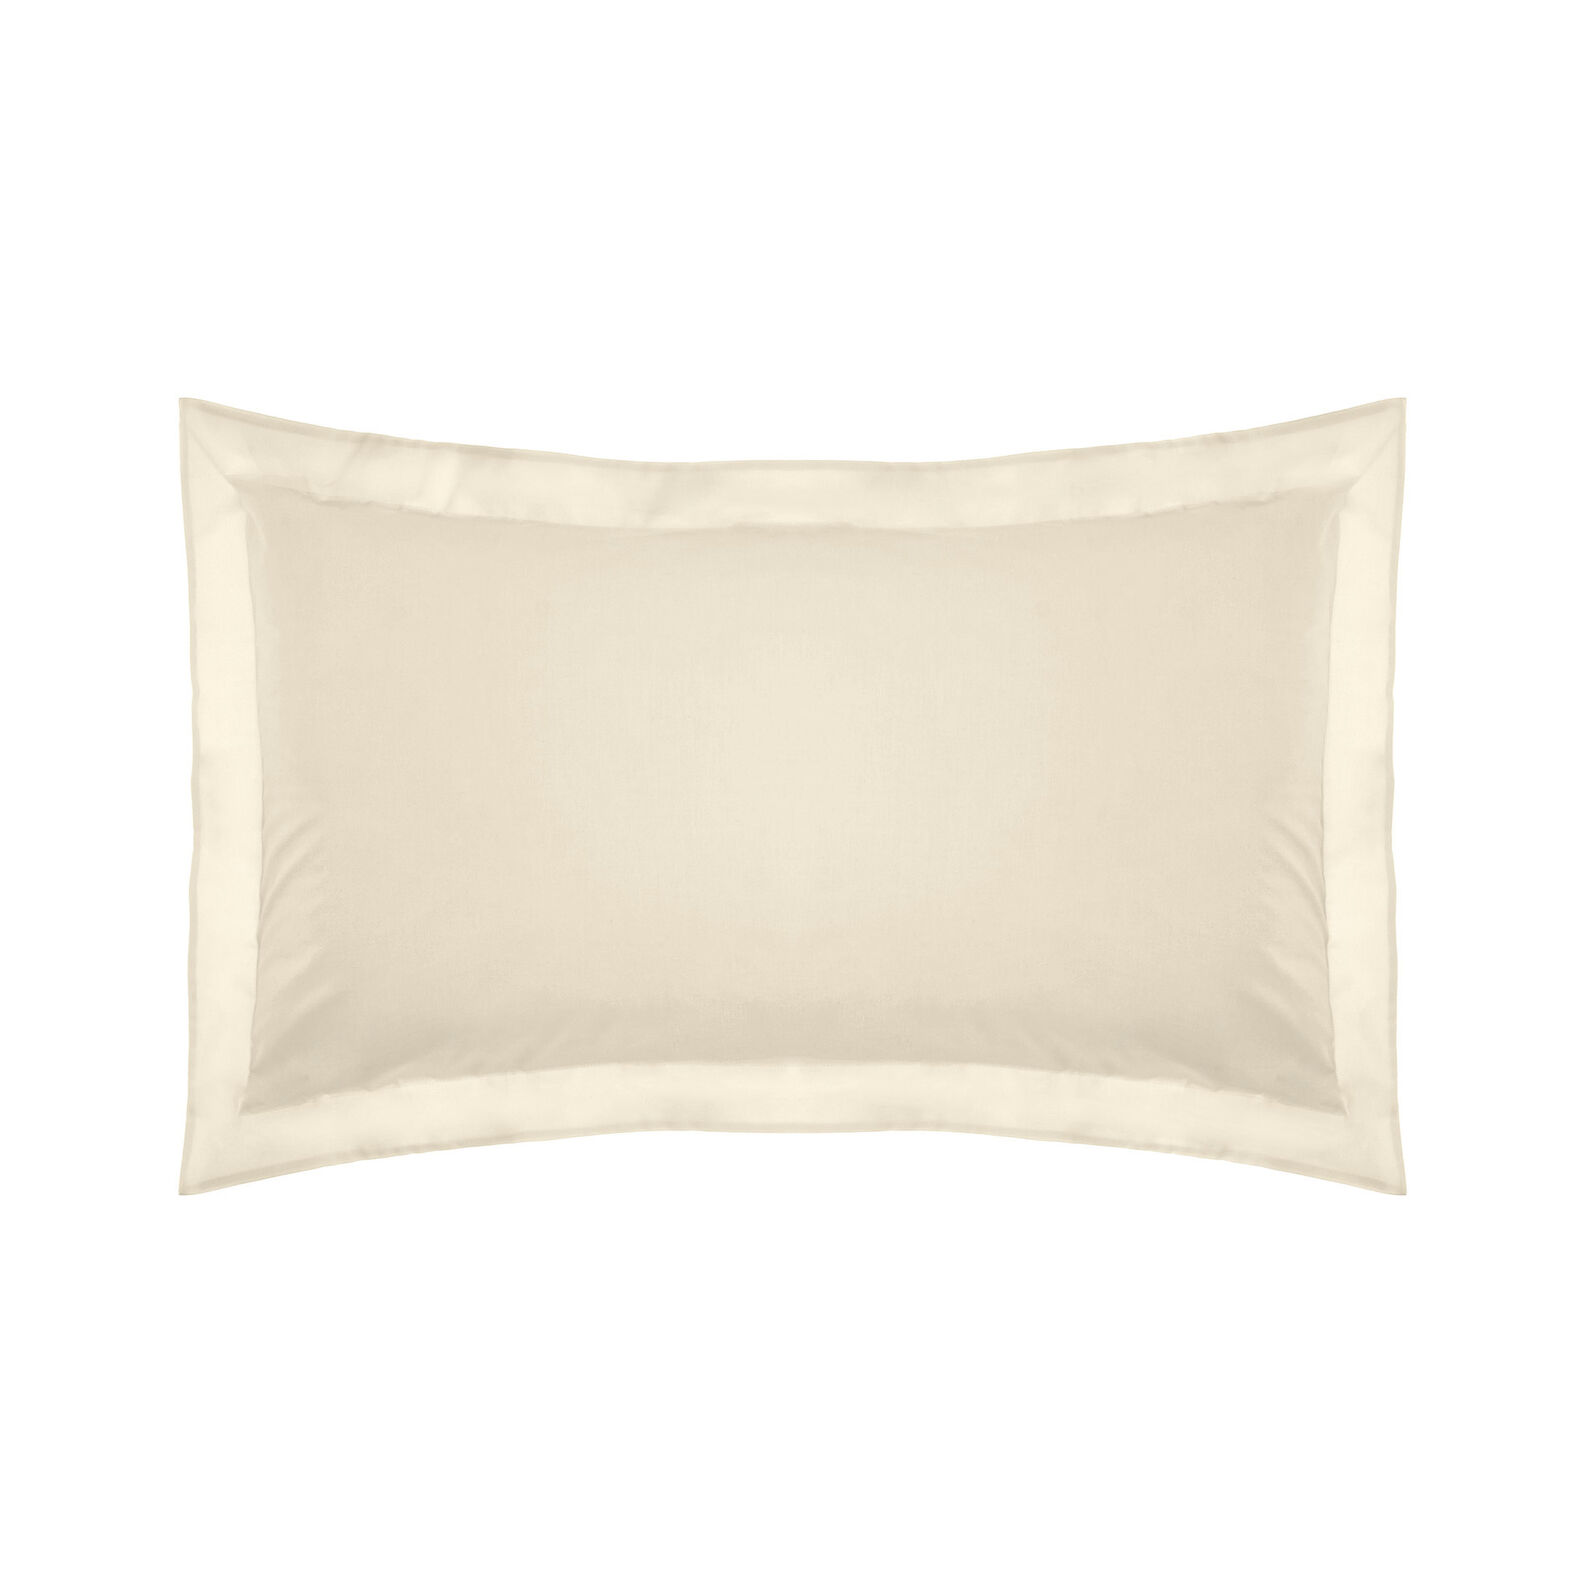 Portofino pillowcase in 100% cotton with hemstitching